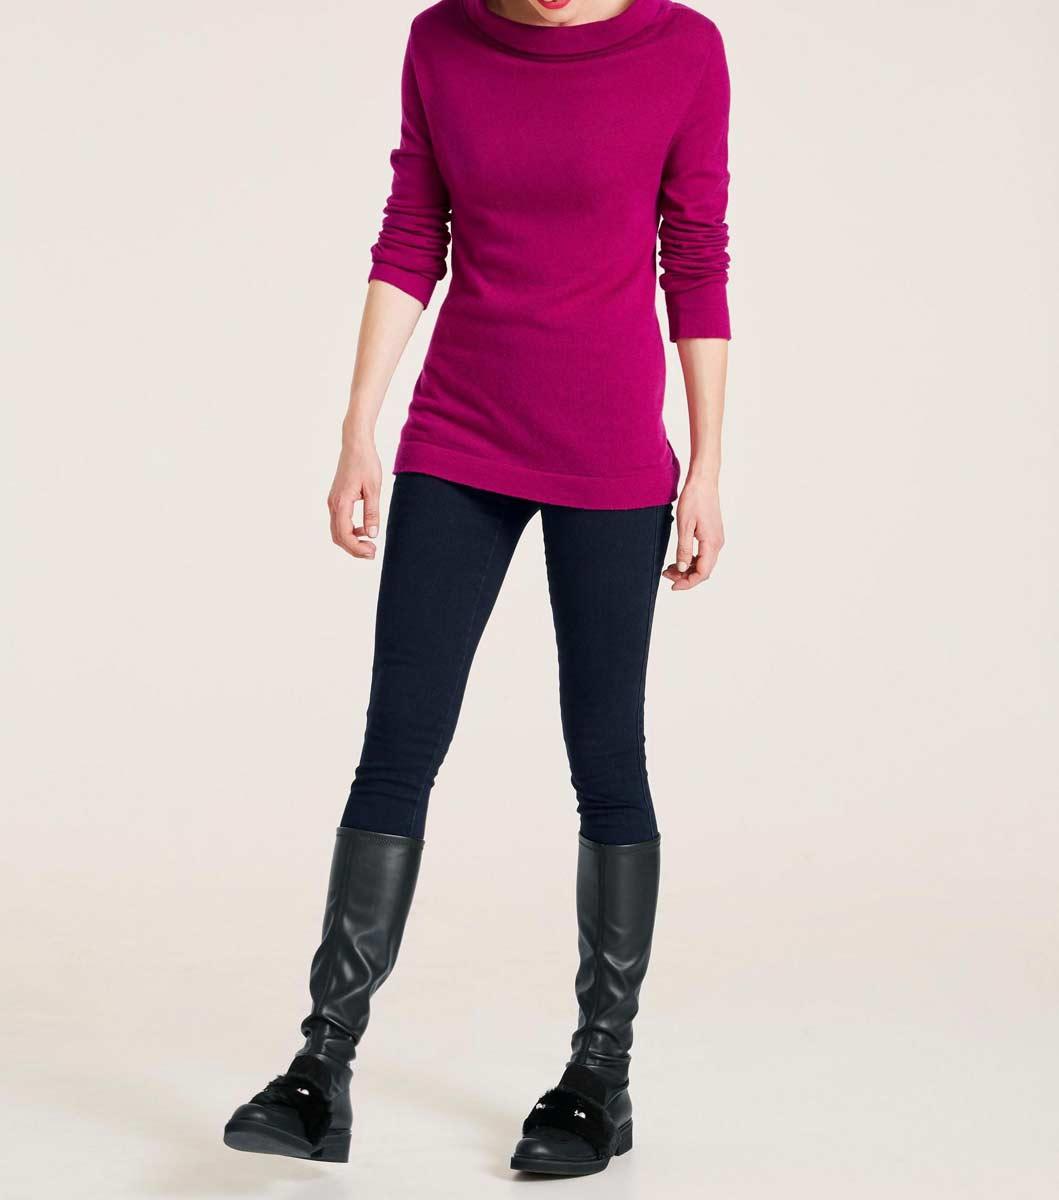 286.620 ASHLEY BROOKE Damen Designer-Rollkragenpullover Cyclam Lila 5% Kaschmir Rolli